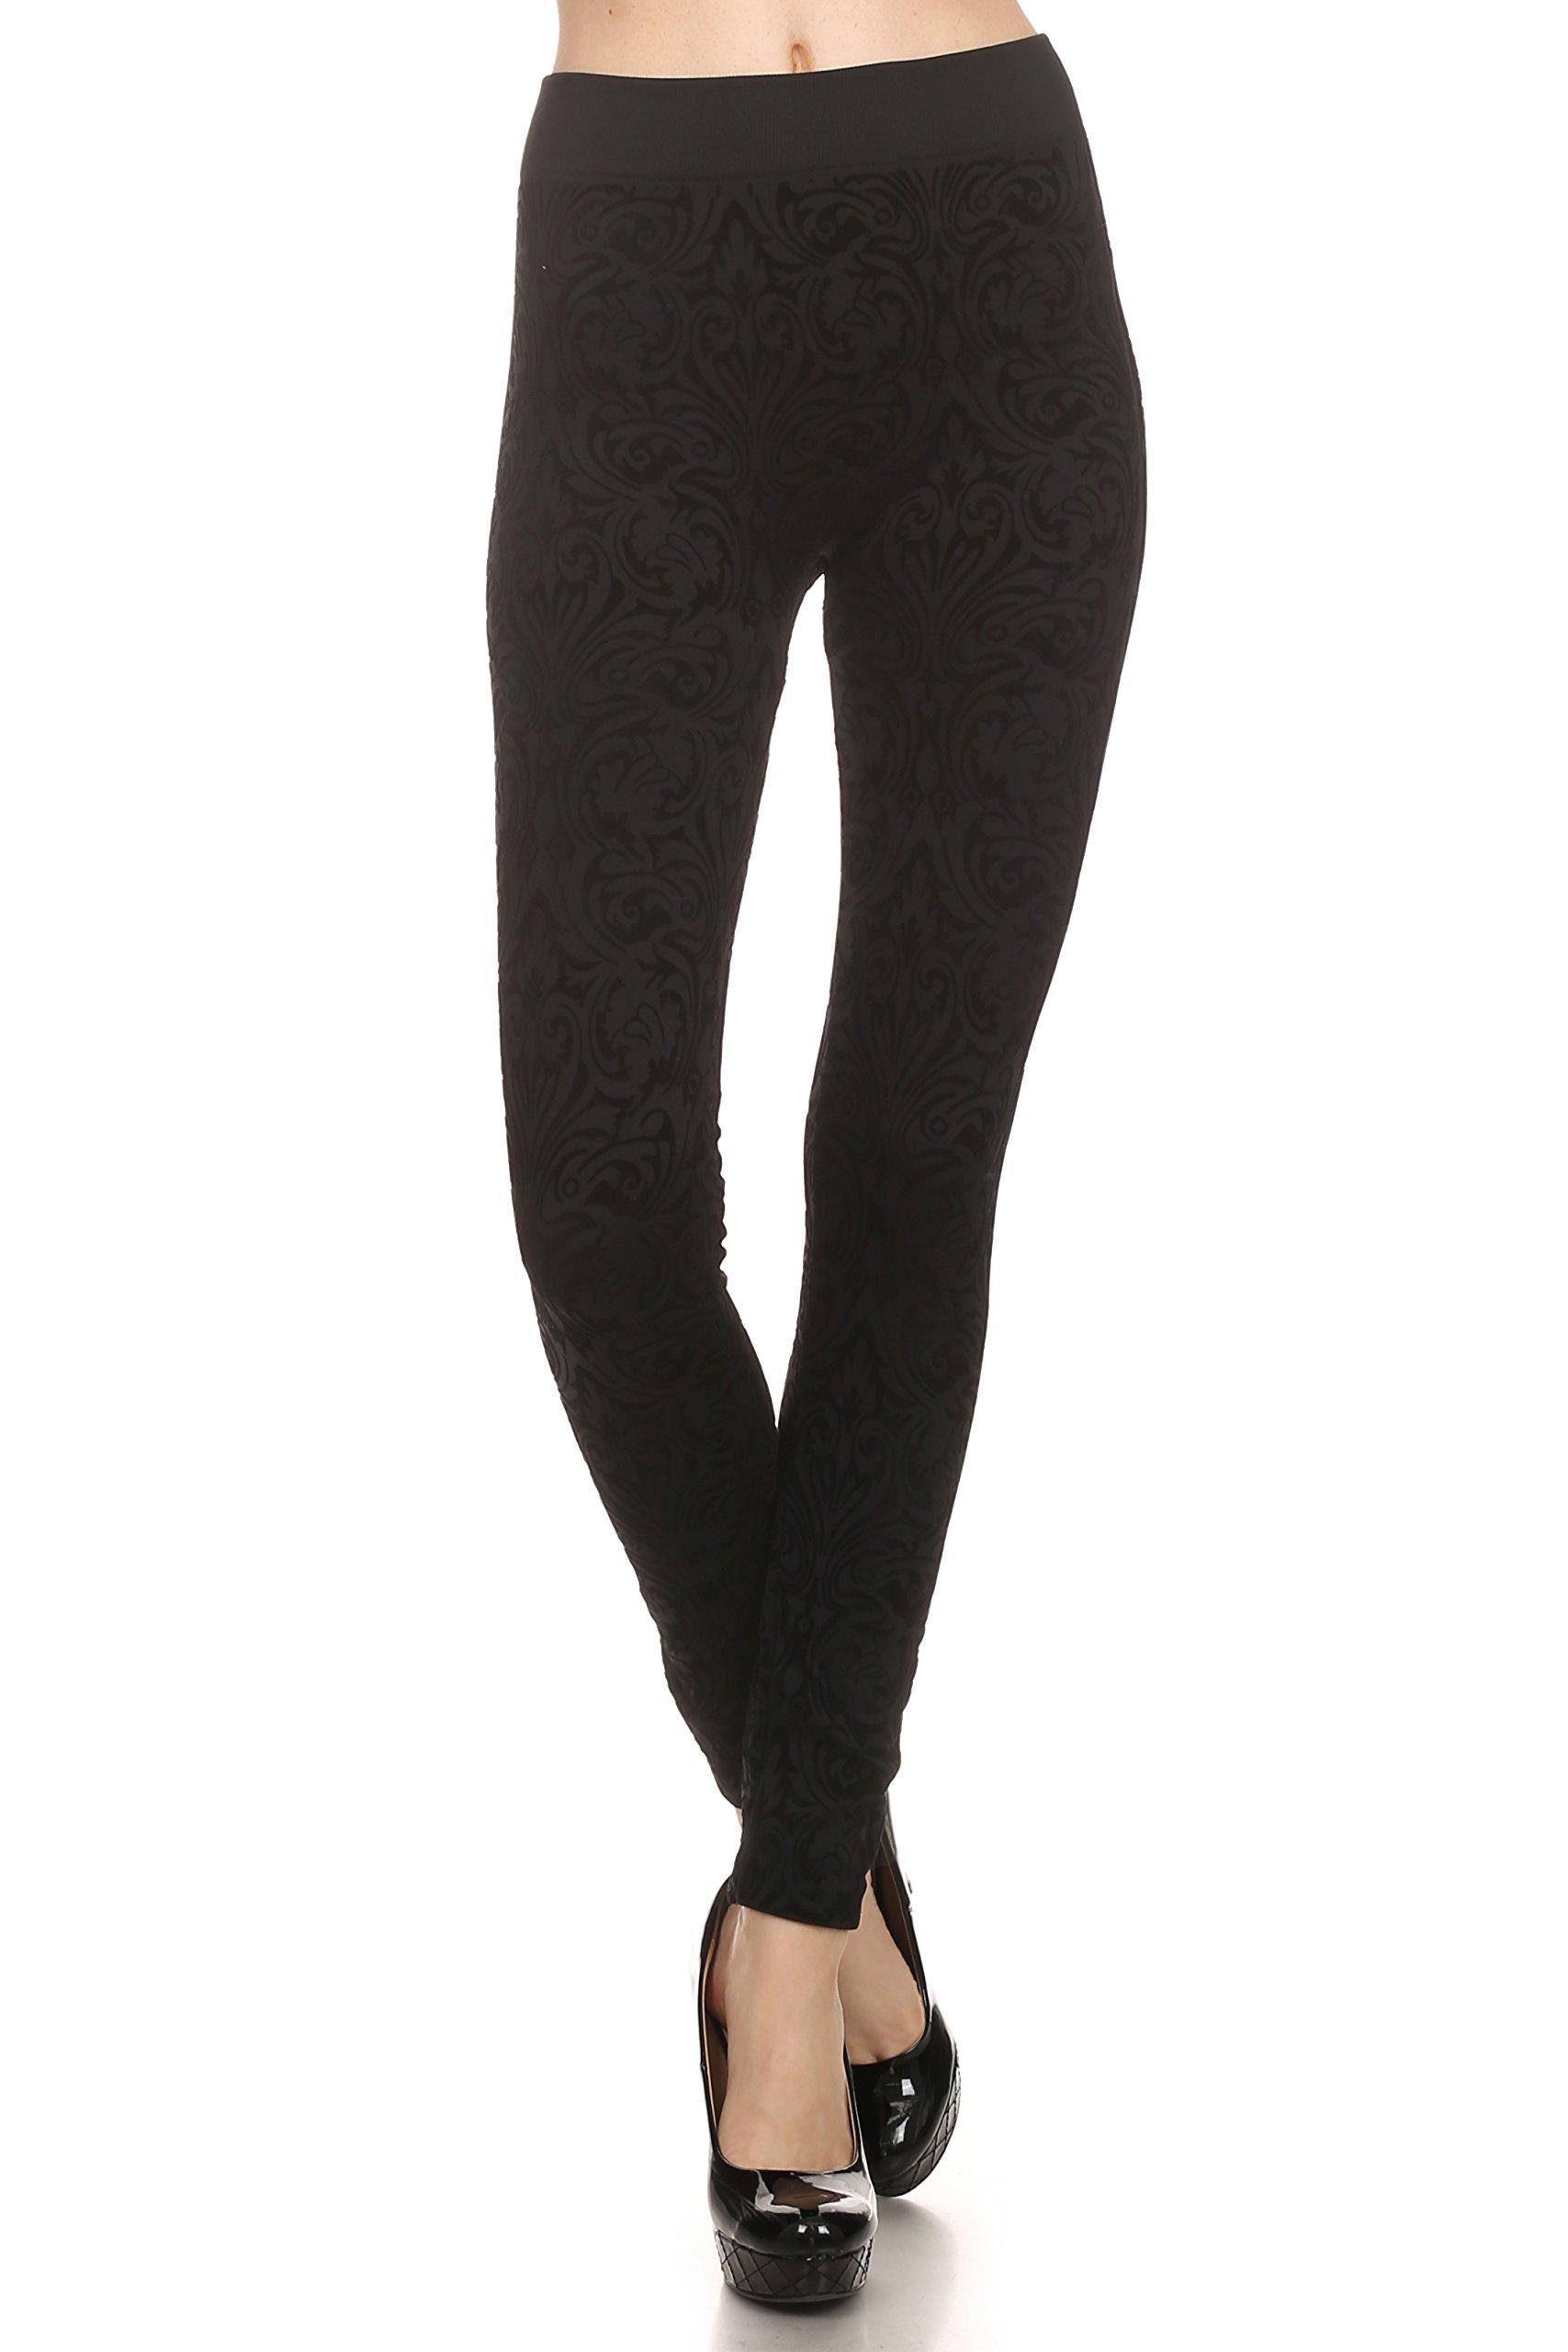 ICONOFLASH Women's Fleece Lined Textured Flocked Velvet Leggings (Victorian, One Size)